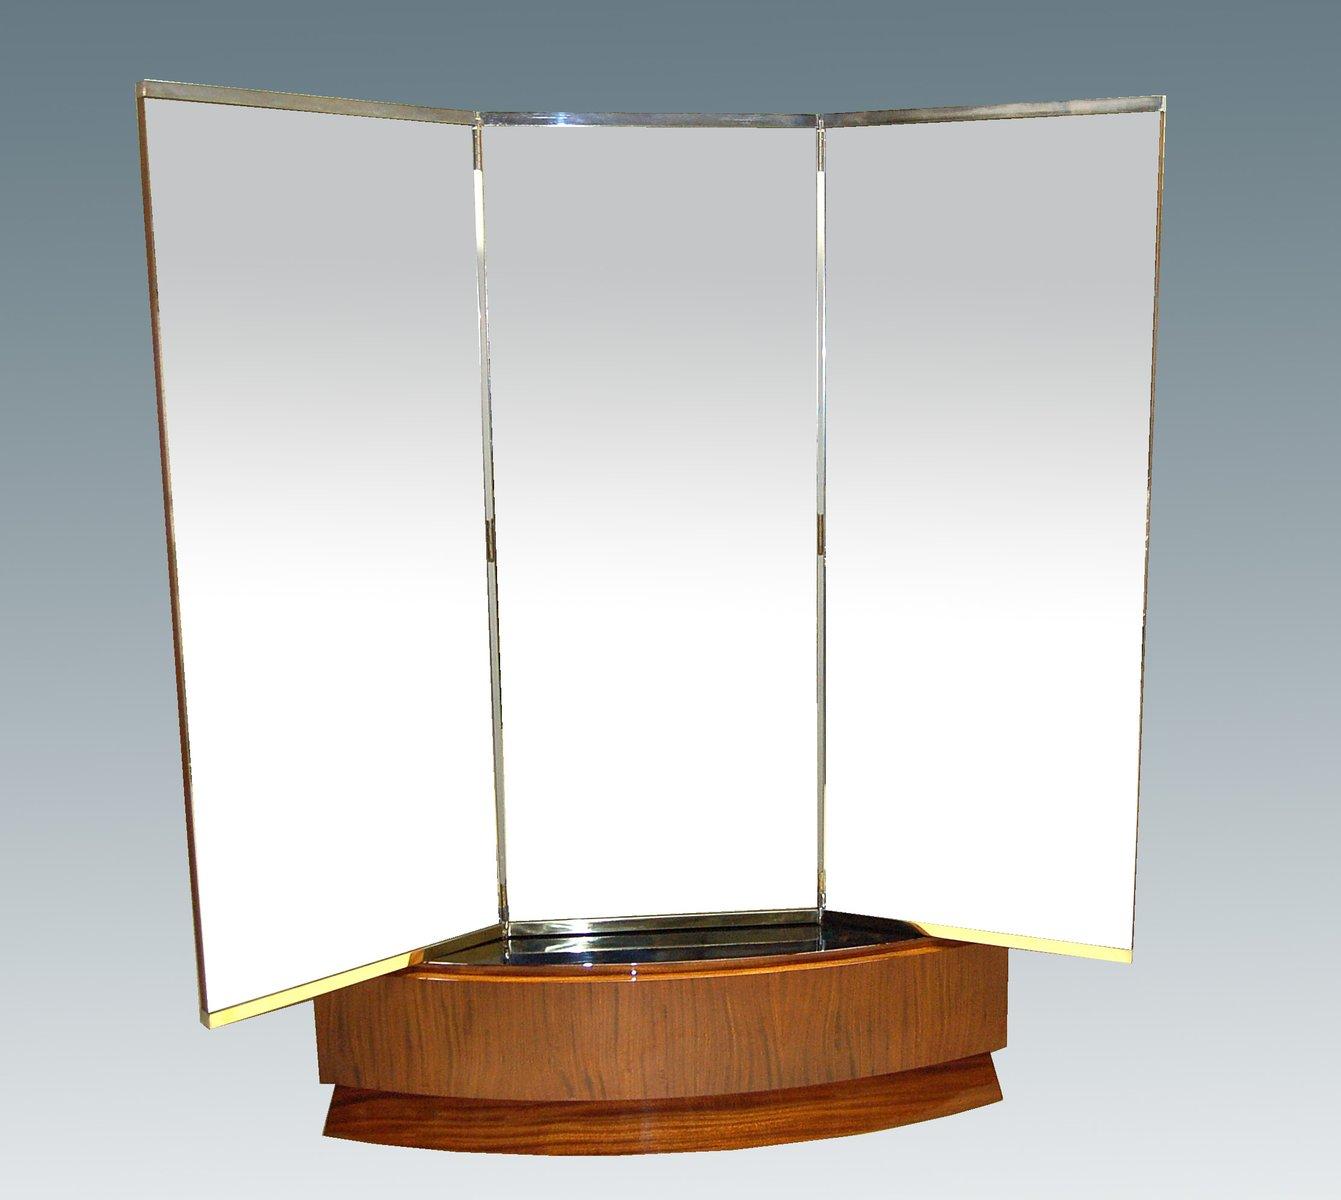 art deco mahagoni messing spiegel 1930er bei pamono kaufen. Black Bedroom Furniture Sets. Home Design Ideas